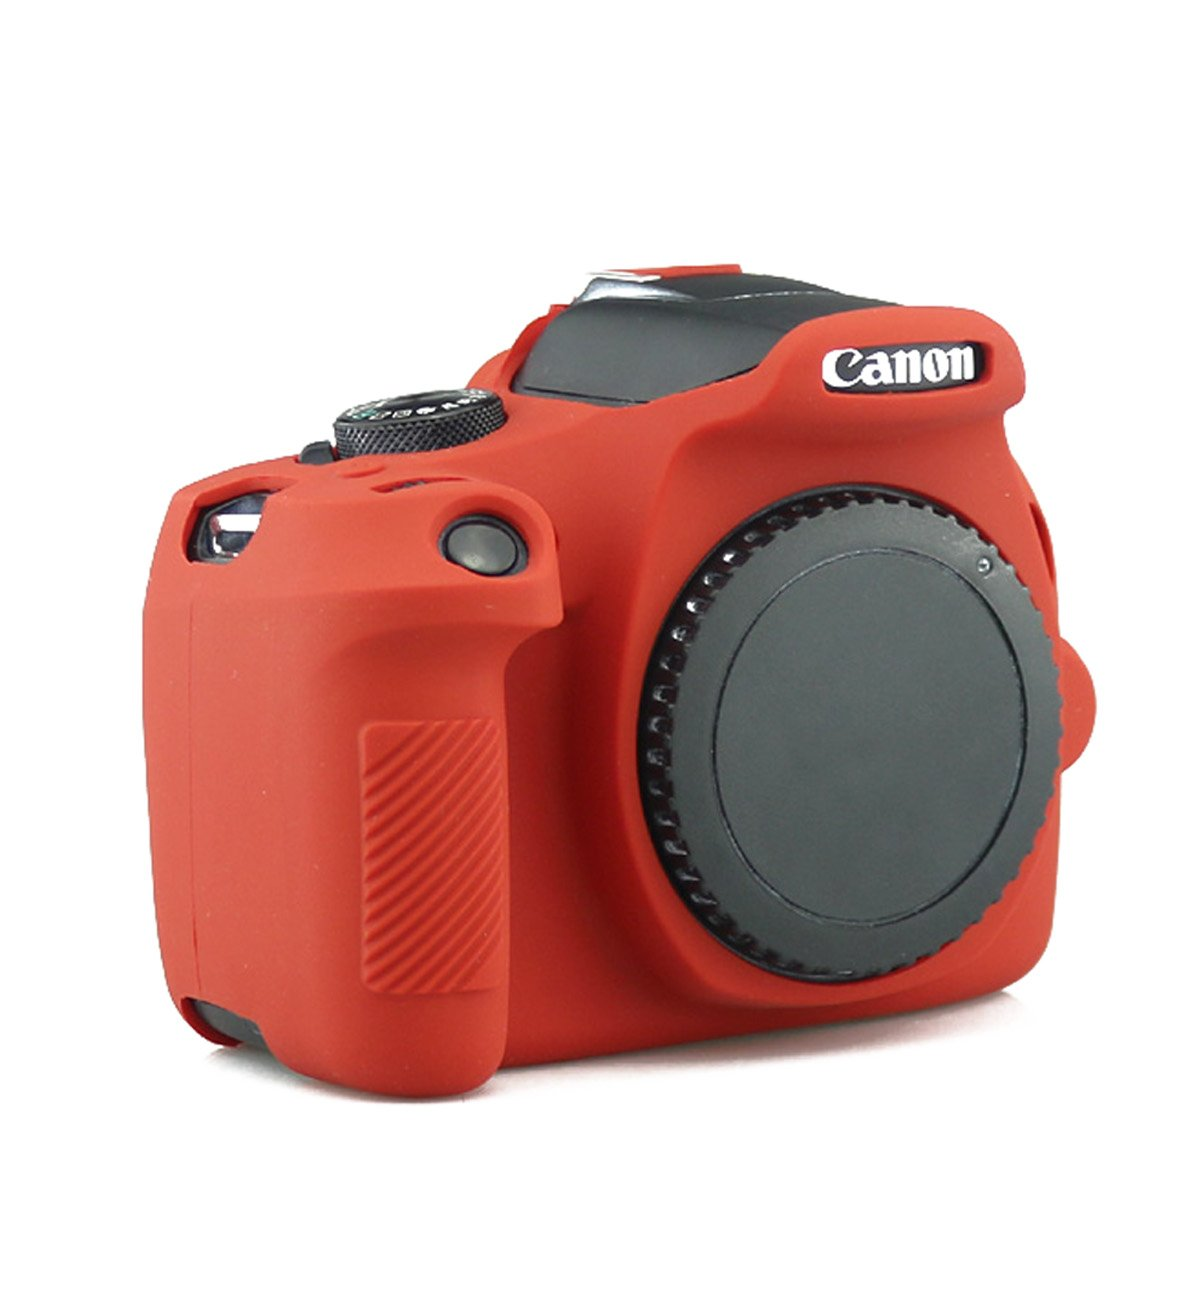 CEARI Silicone Camera Case Full Body Protective Cover Skin for Canon EOS 1300D Rebel T6 Digital Camera + MicroFiber Cloth - Red